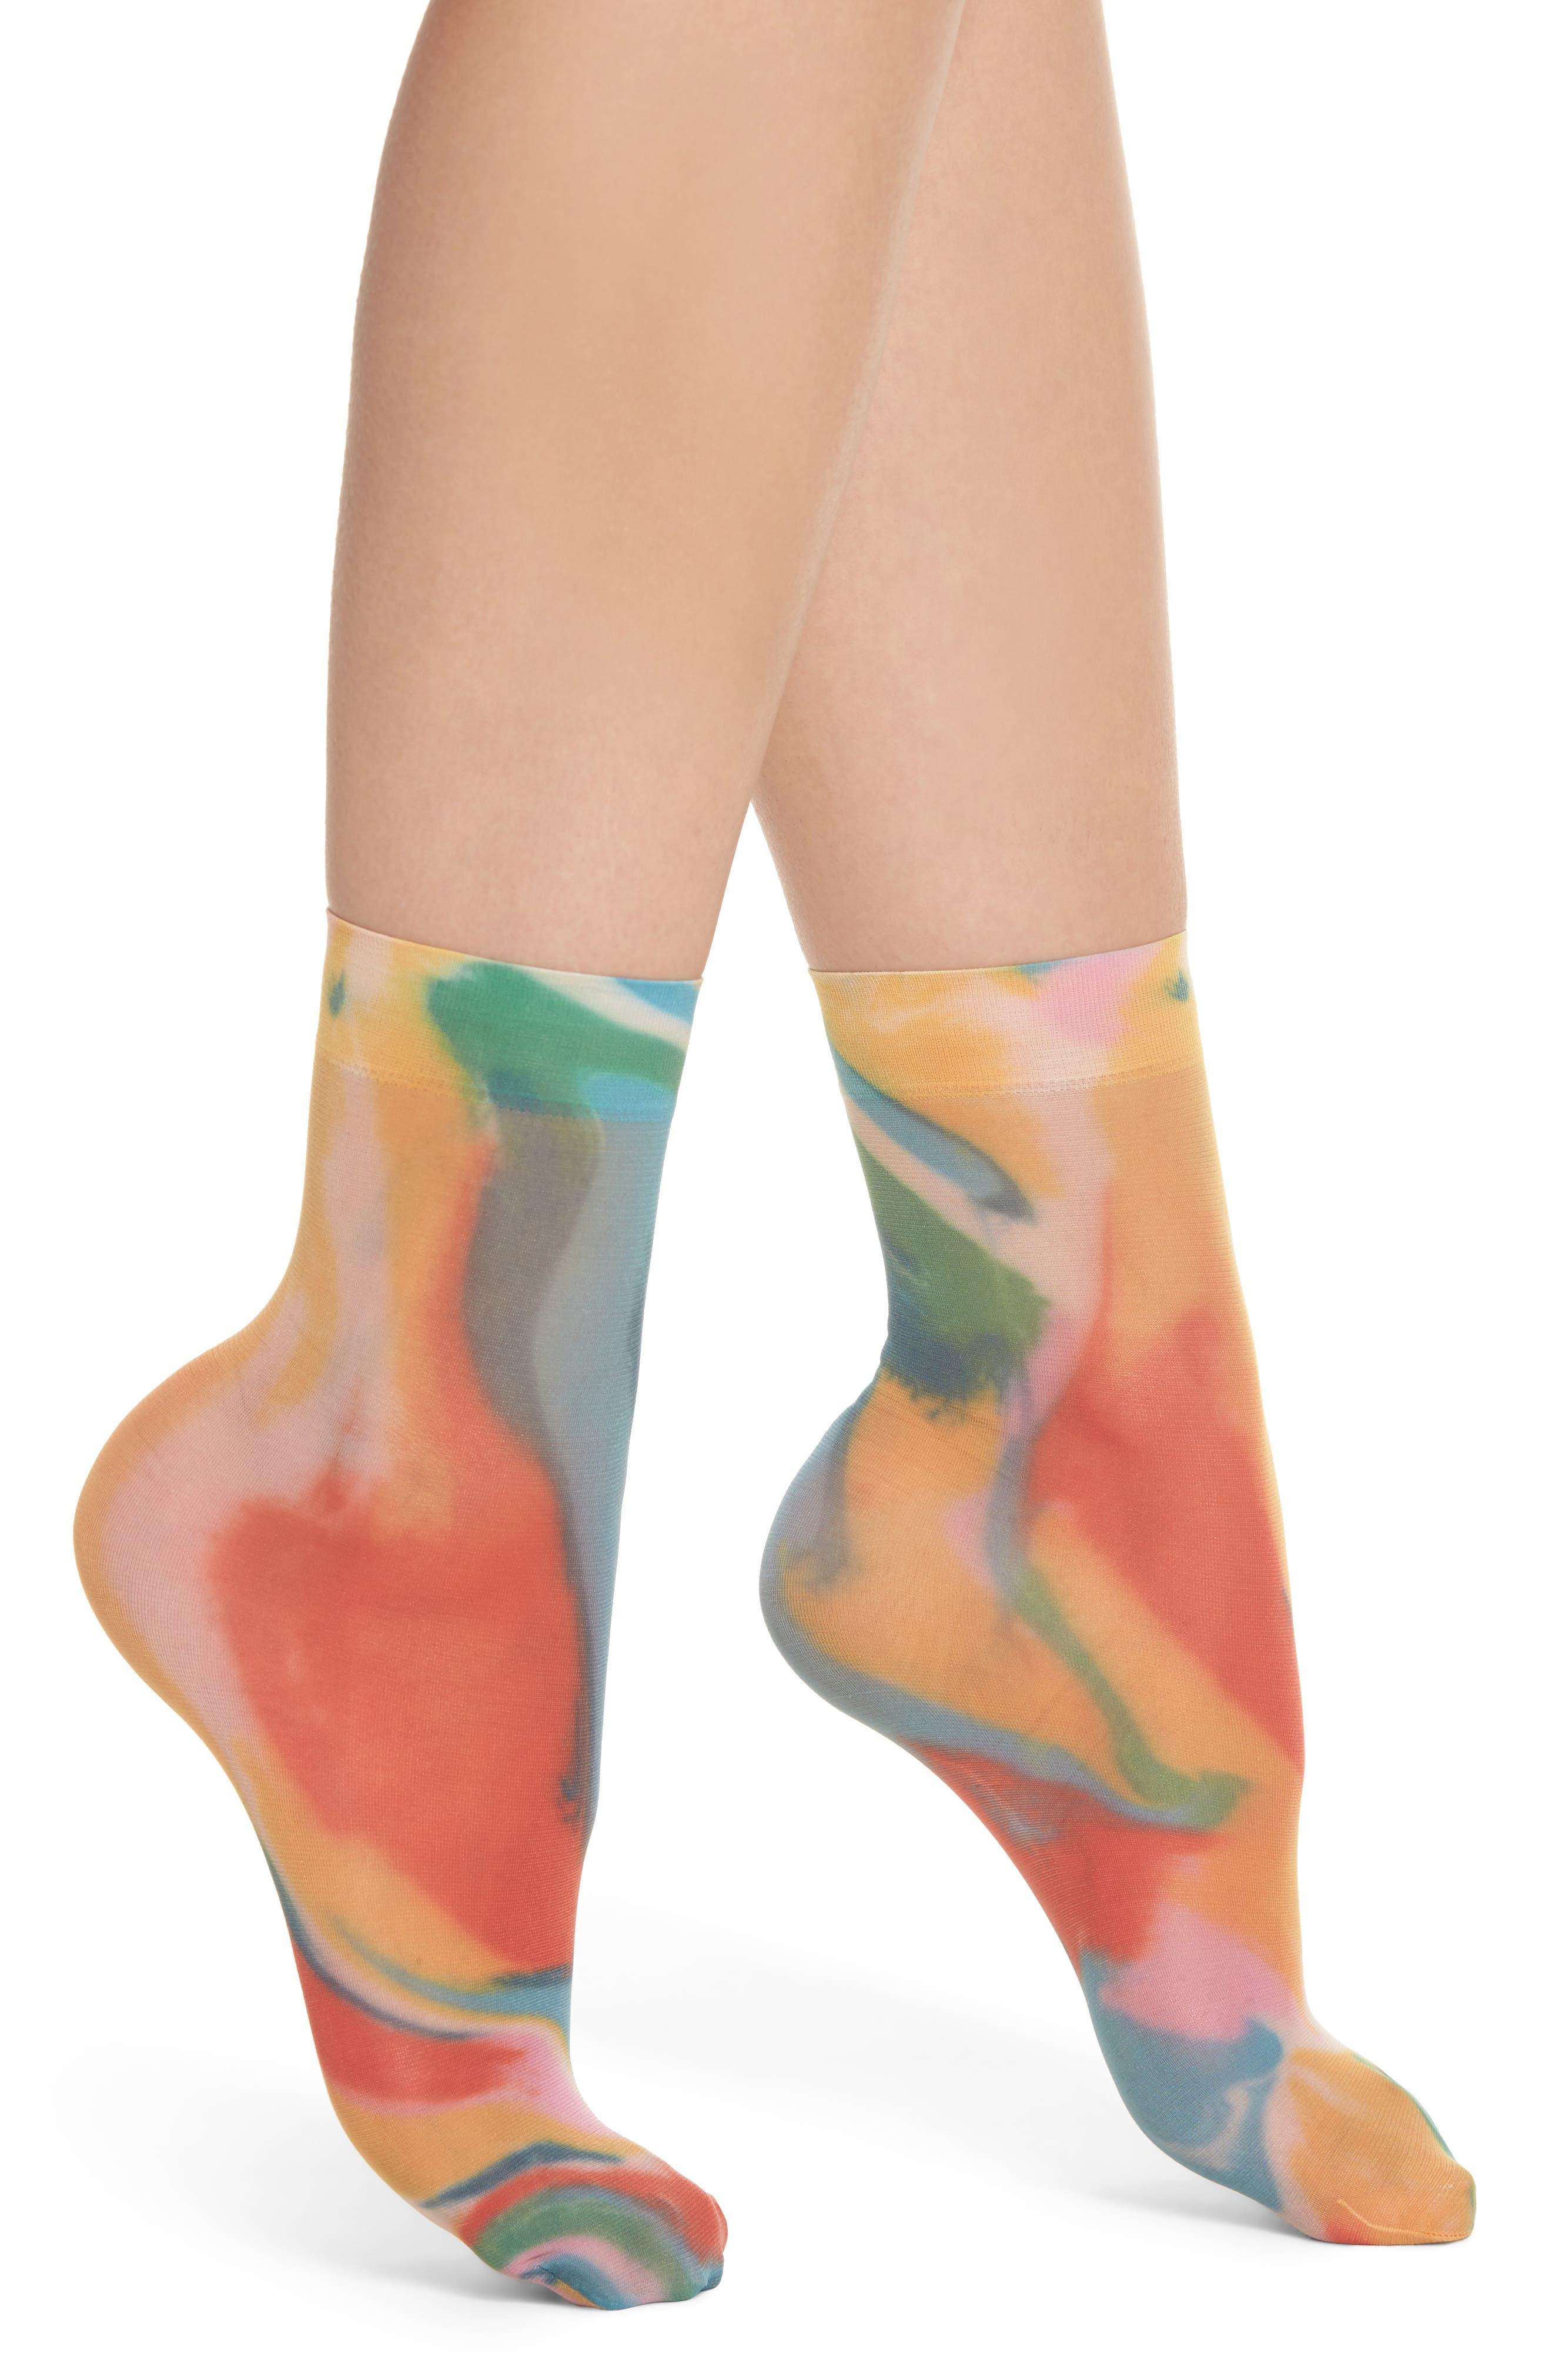 Mia Mosaic Socks,                         Main,                         color, Assorted